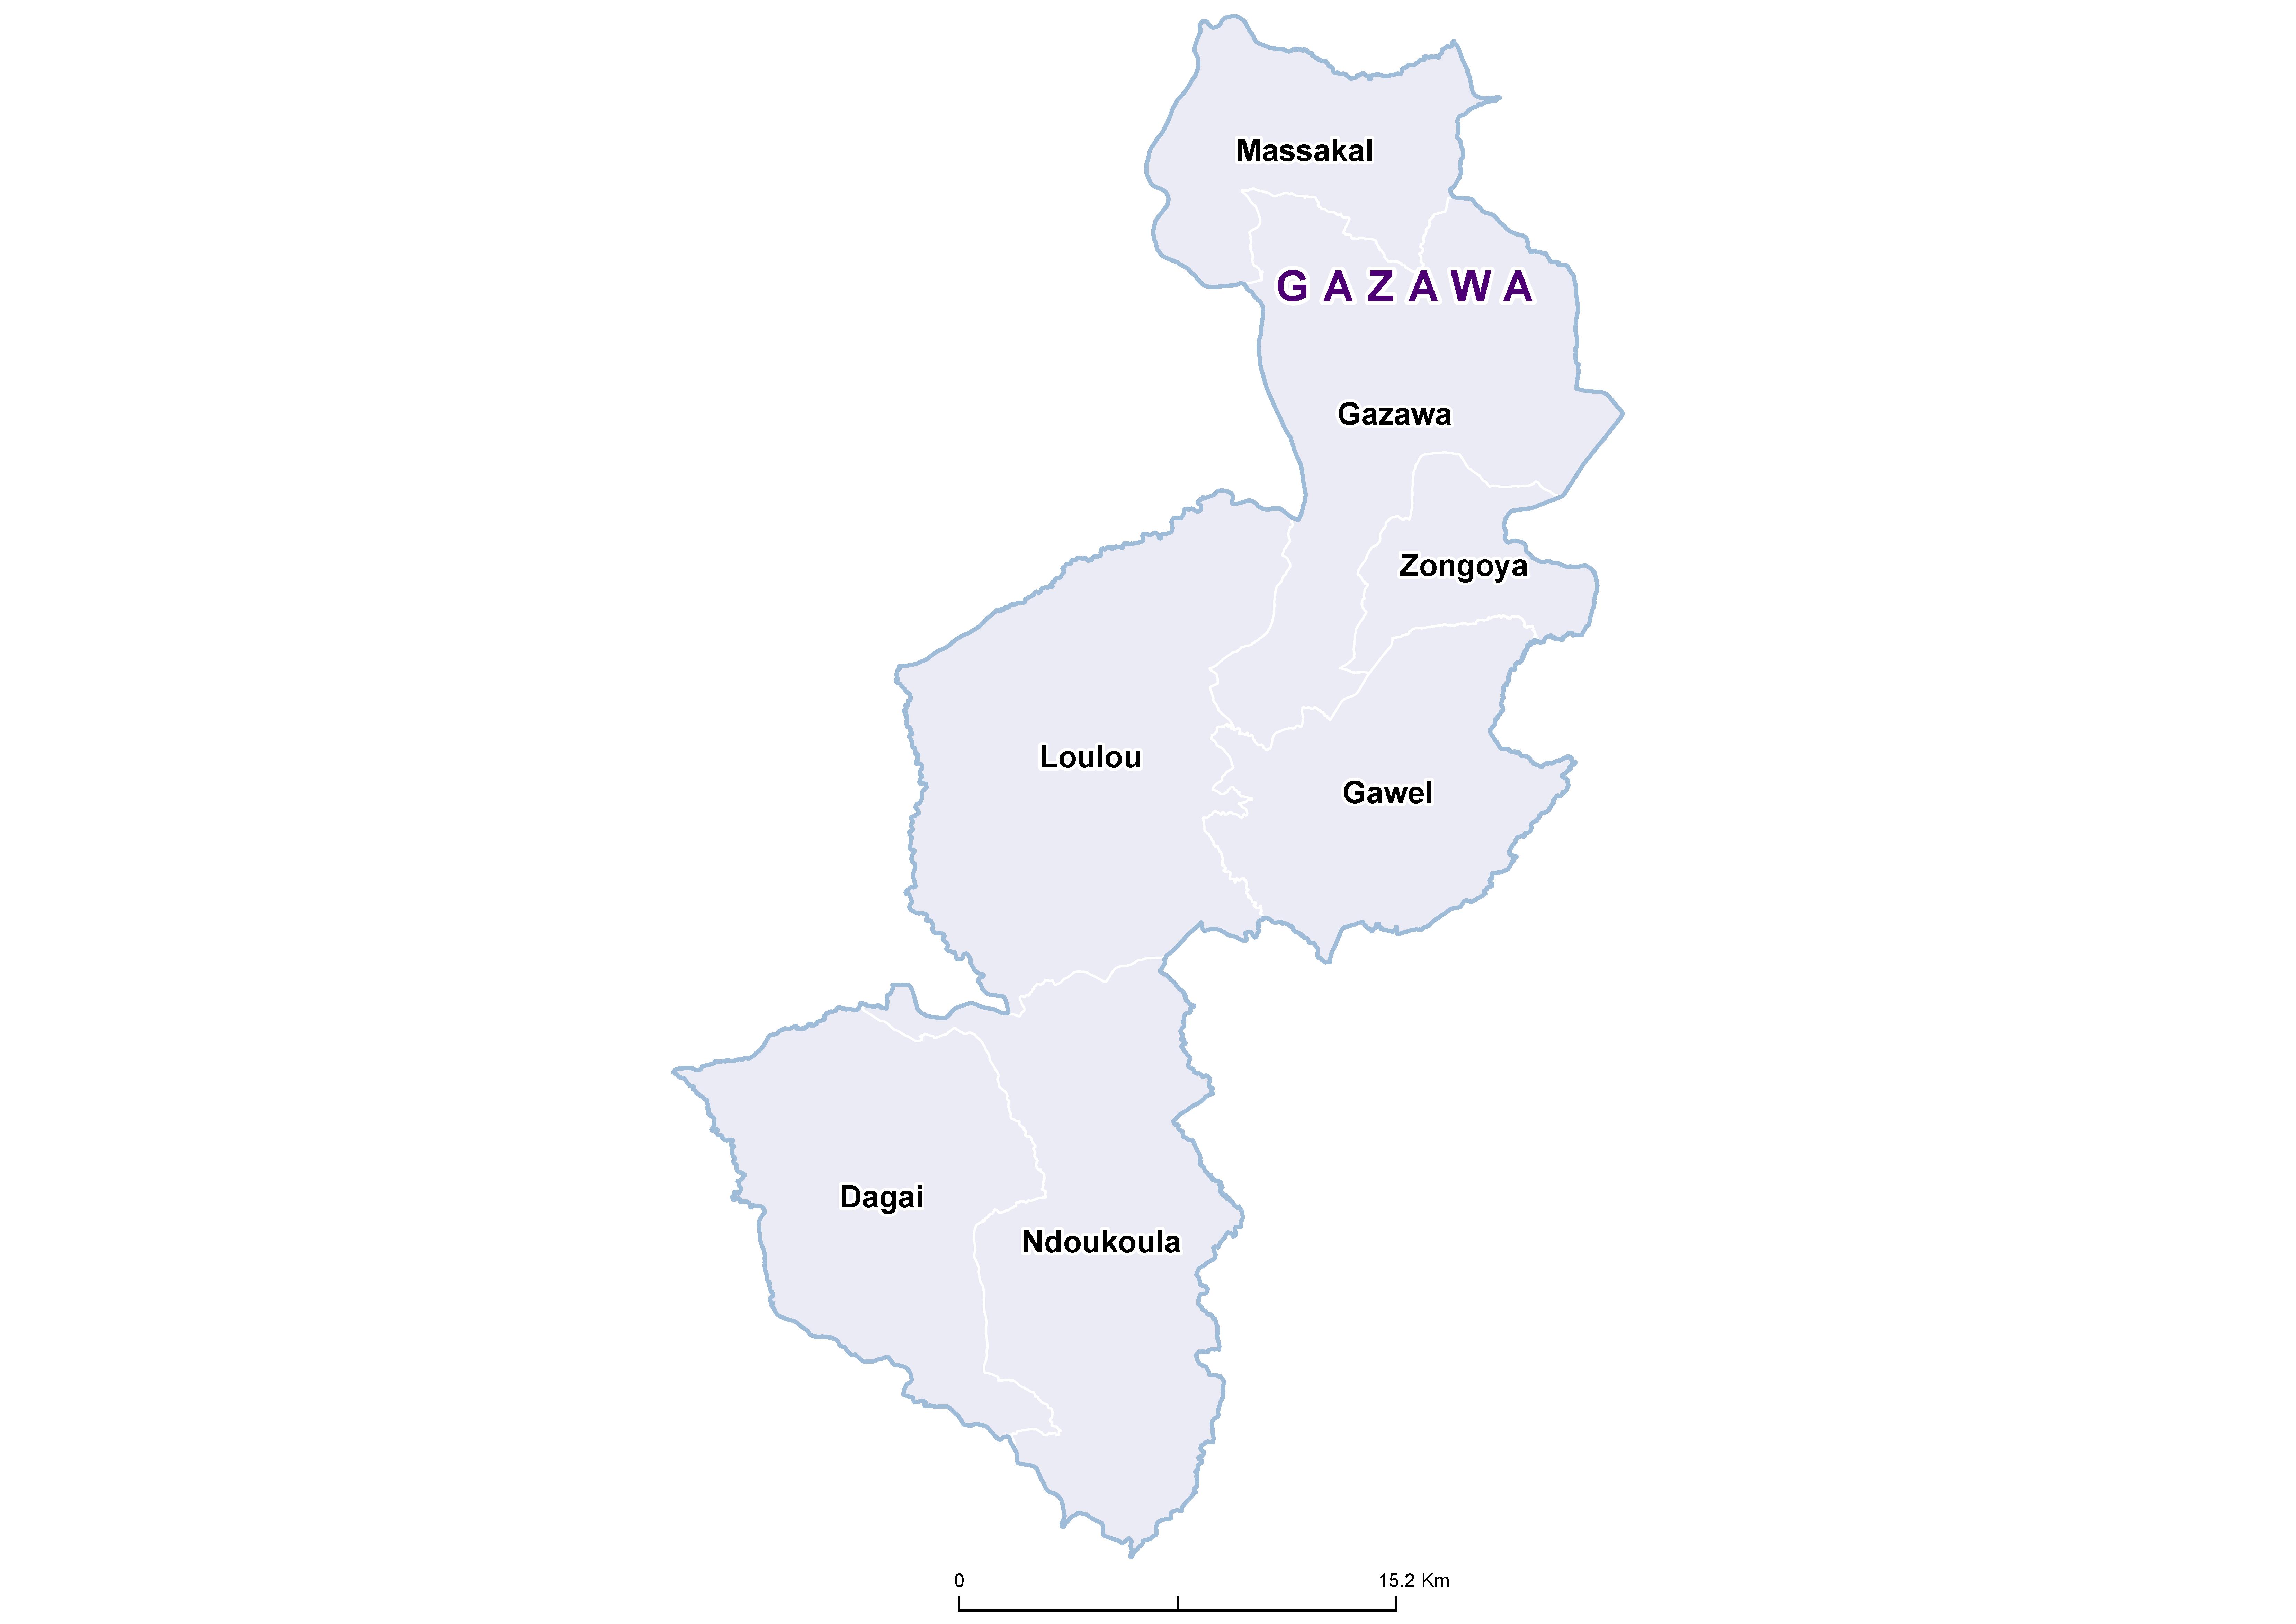 Gazawa SCH 20180001